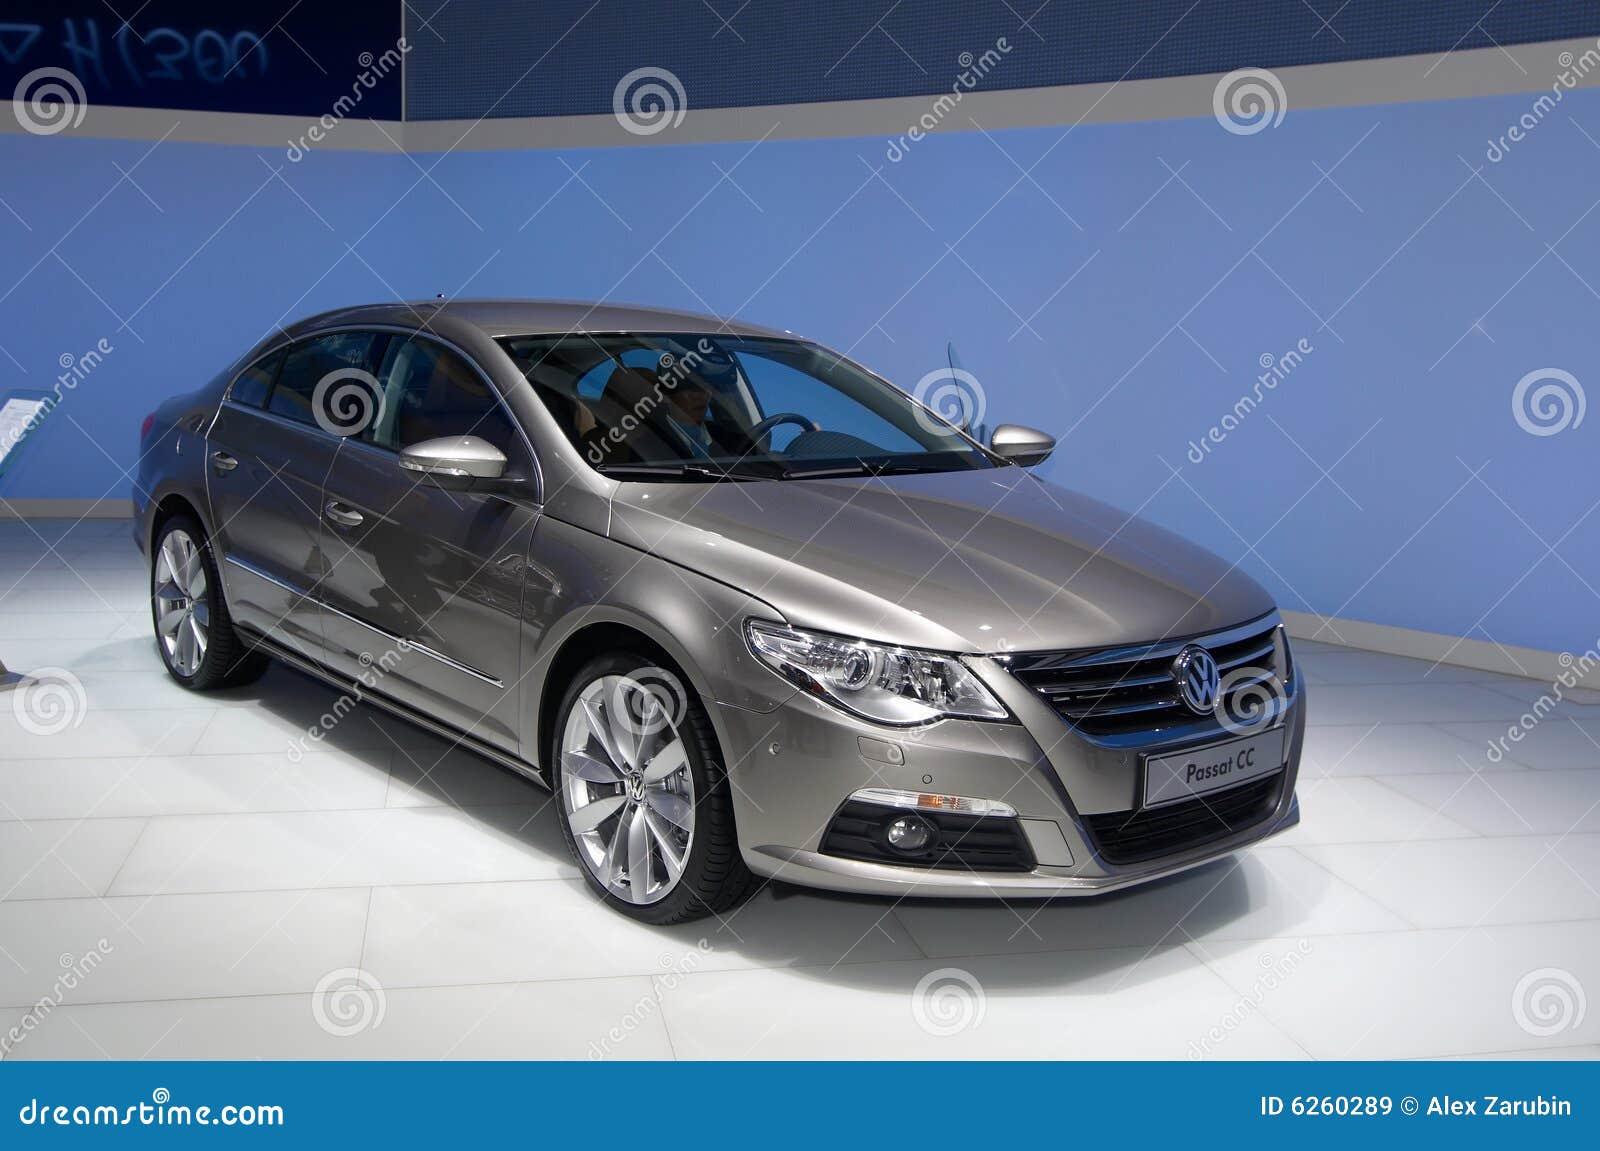 Volkswagen Passat centímetro cúbico